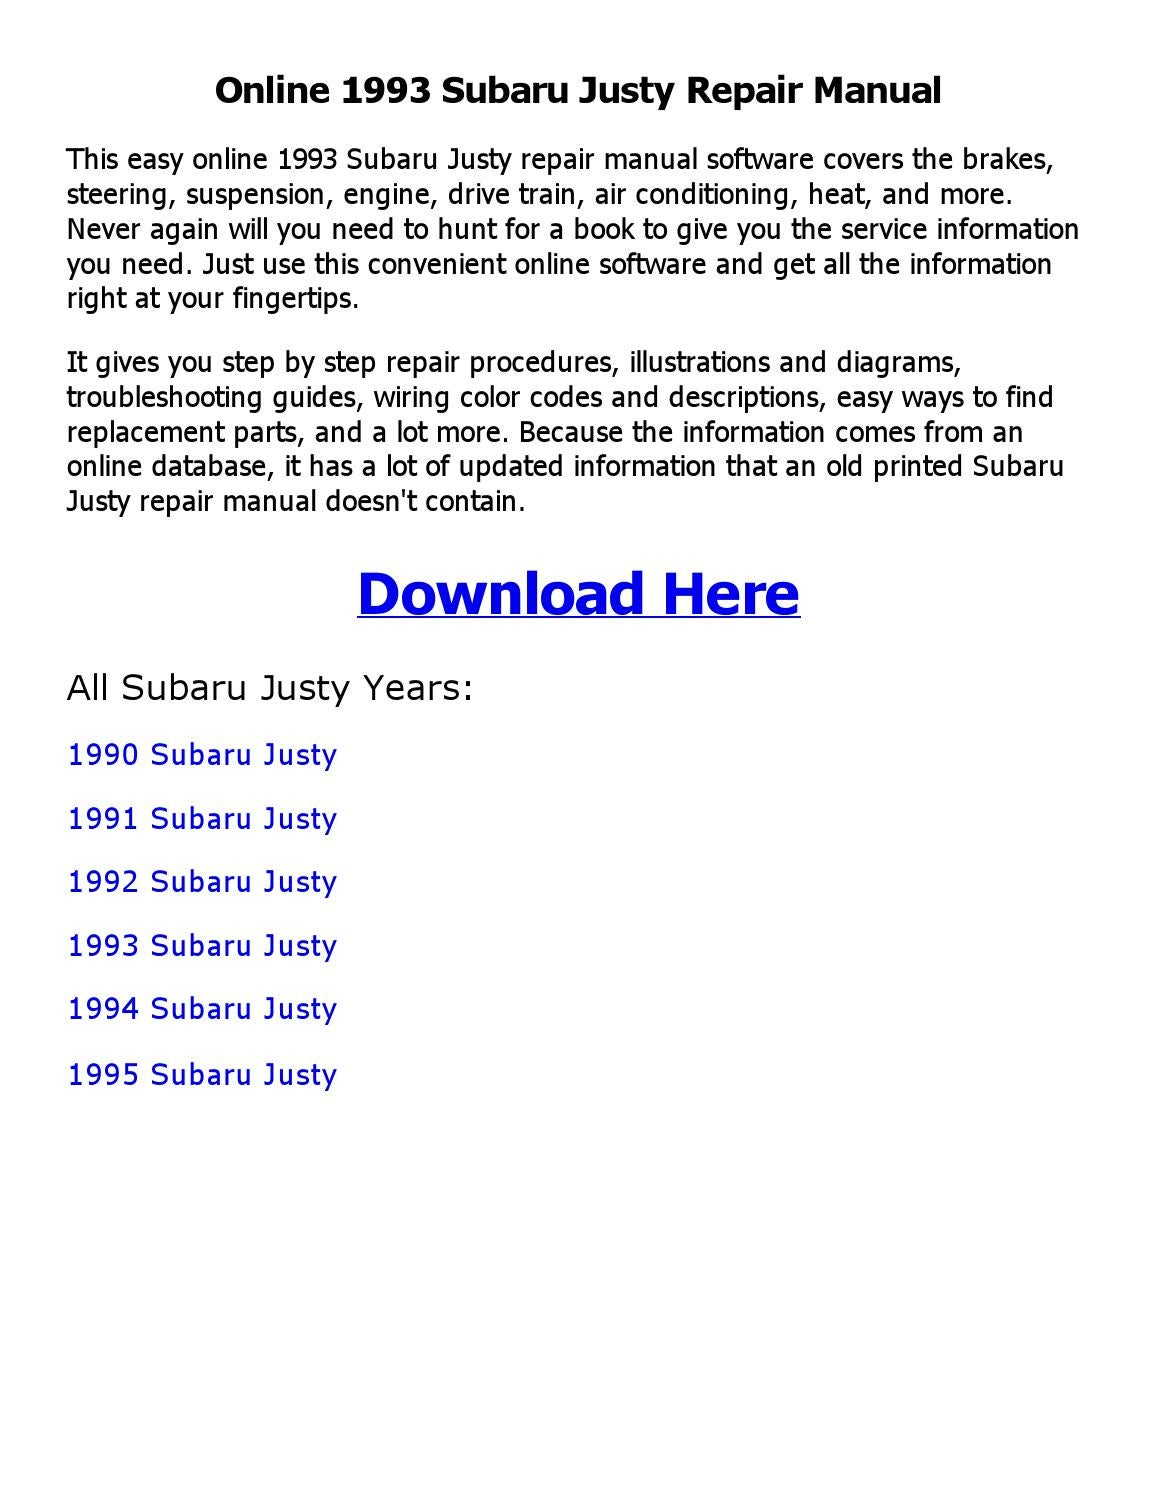 1990 Subaru Wiring Diagram Library Club K Home Page 1982 Kp61 Dash Awesome Loyale Photo Electrical 1994 Justy Radio